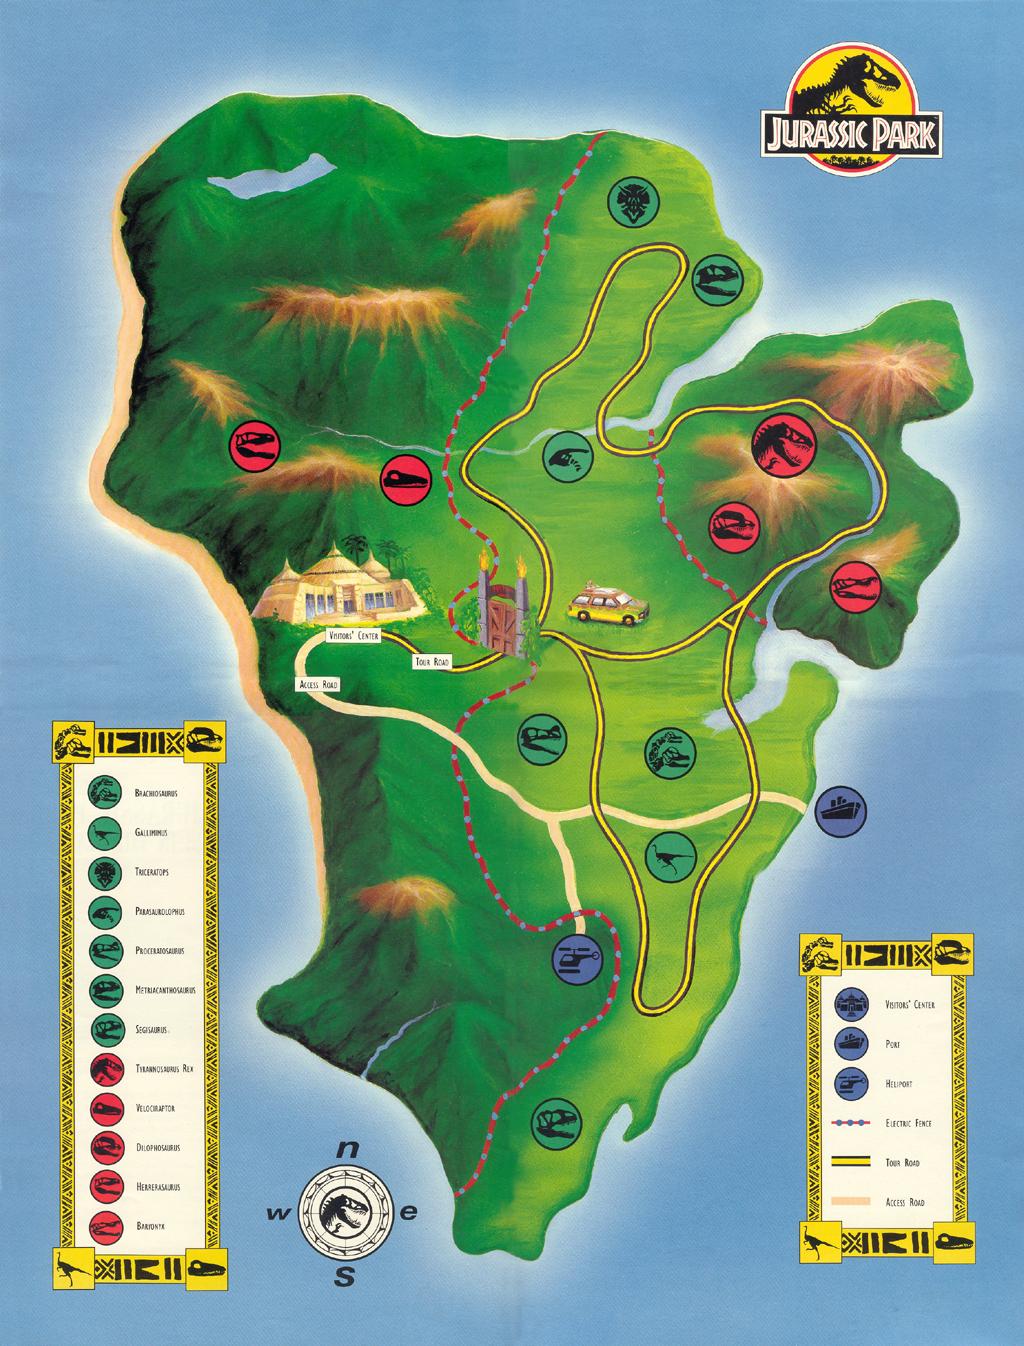 Map Of Jurassic Park Park Map | Jurassic Park wiki | FANDOM powered by Wikia